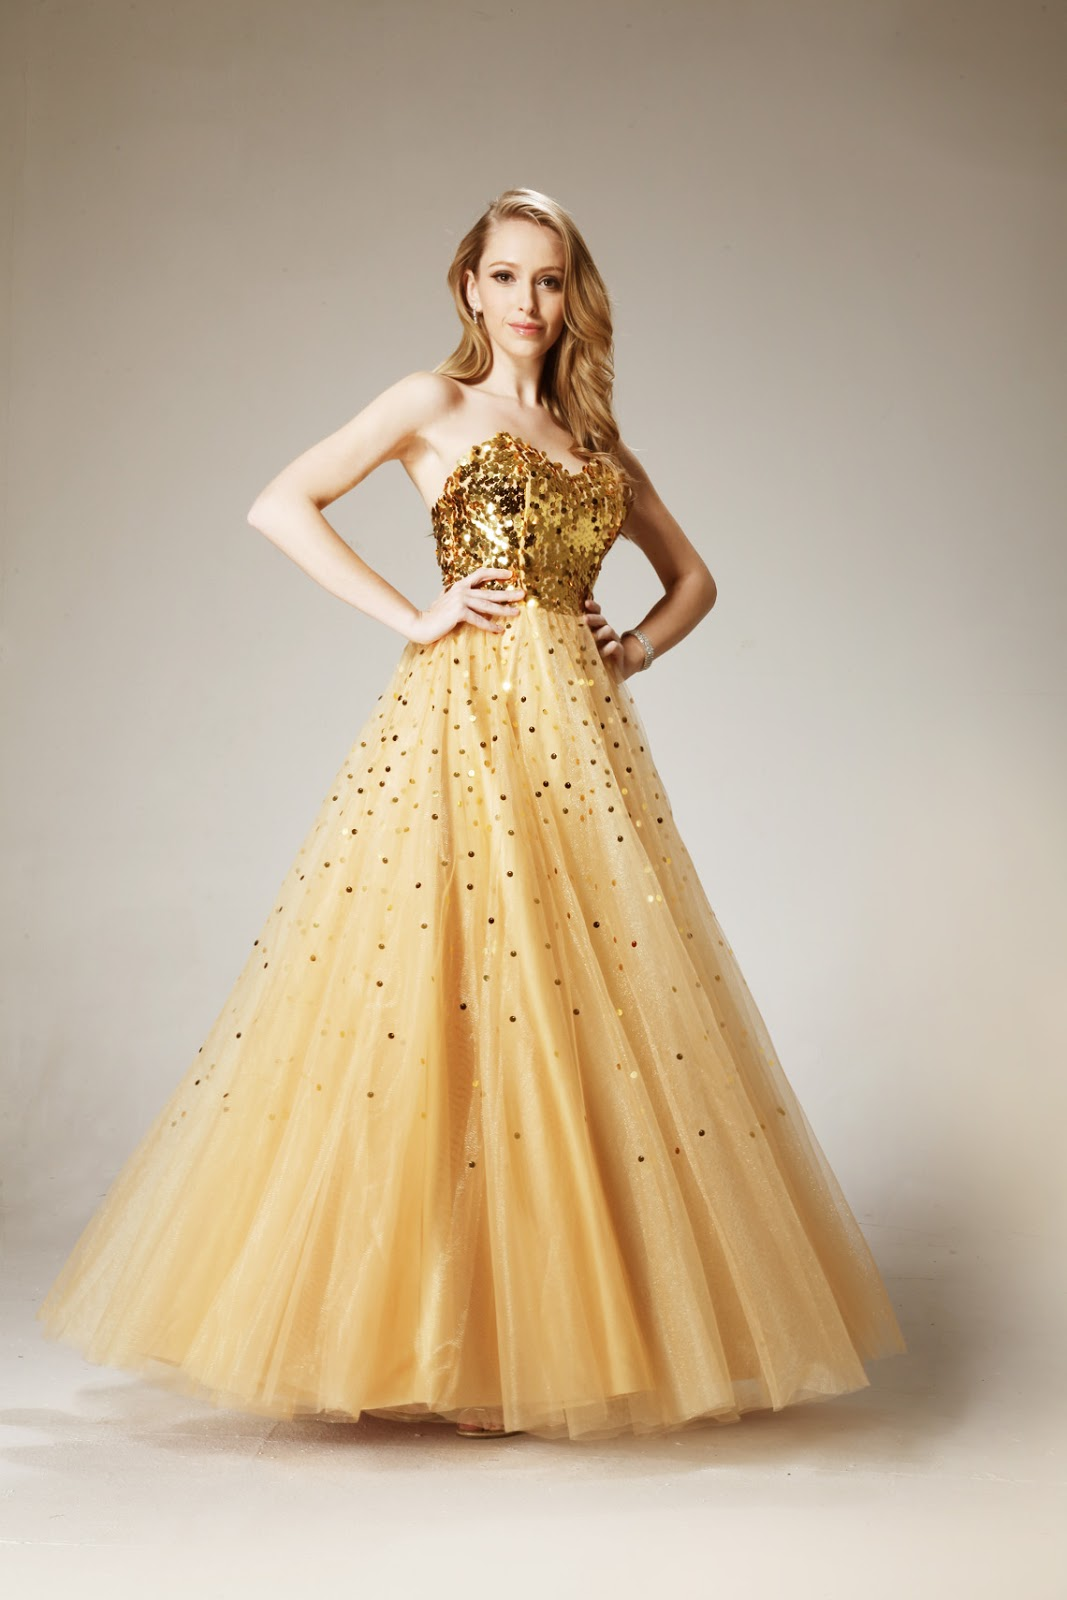 Ballroom Lighting Pic: Ballroom Gowns